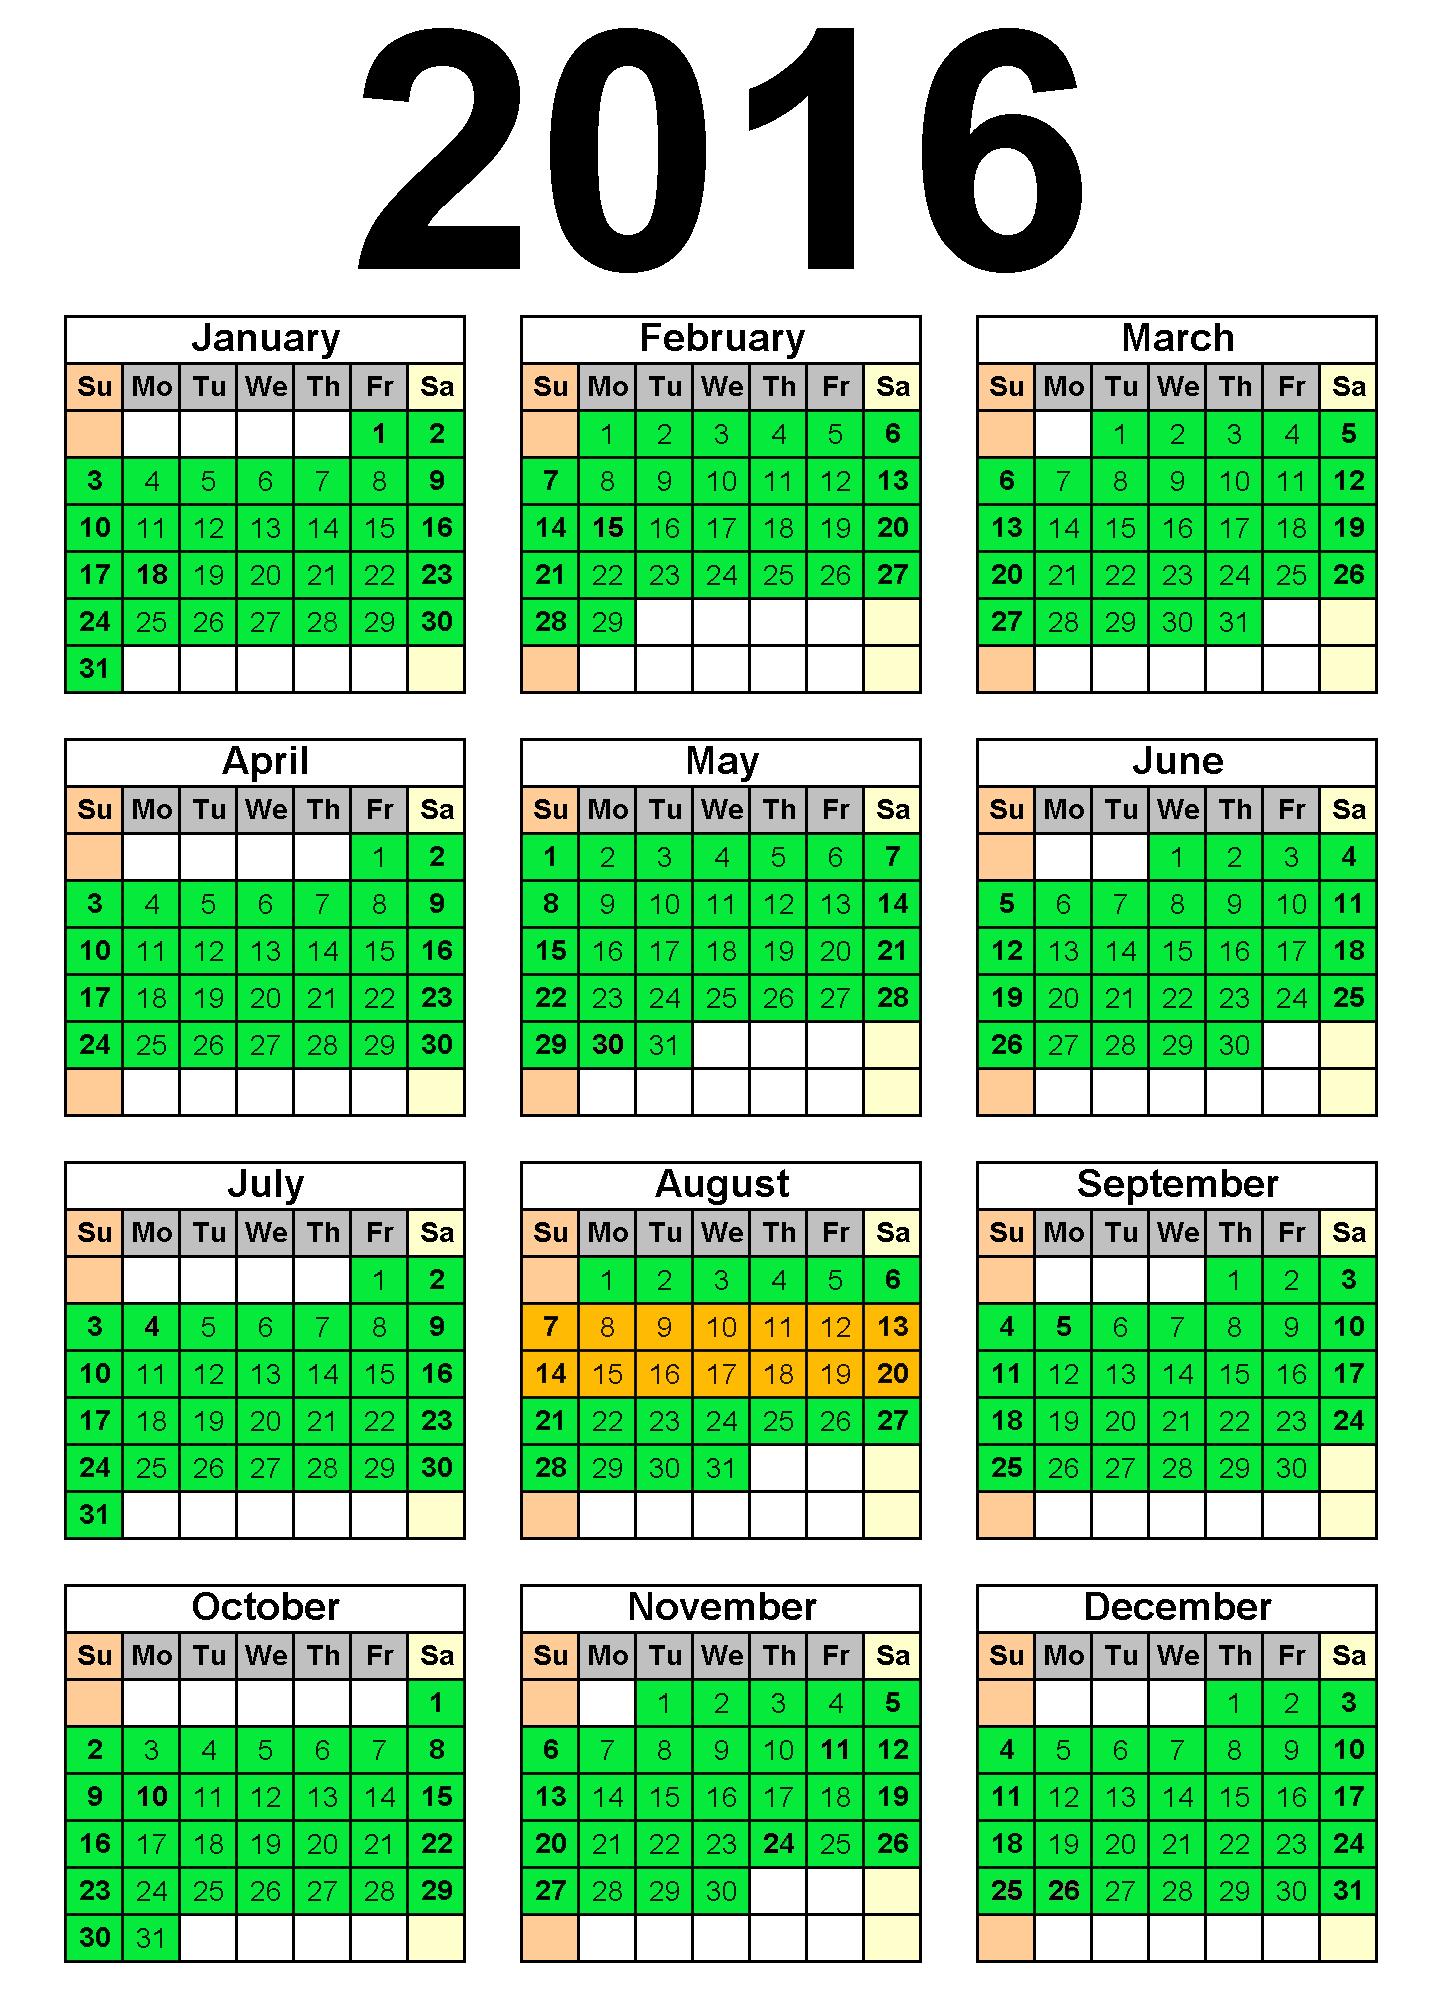 Divemaster internship schedule 2016 Tenerife, Canary Islands, PADI Divemaster internship